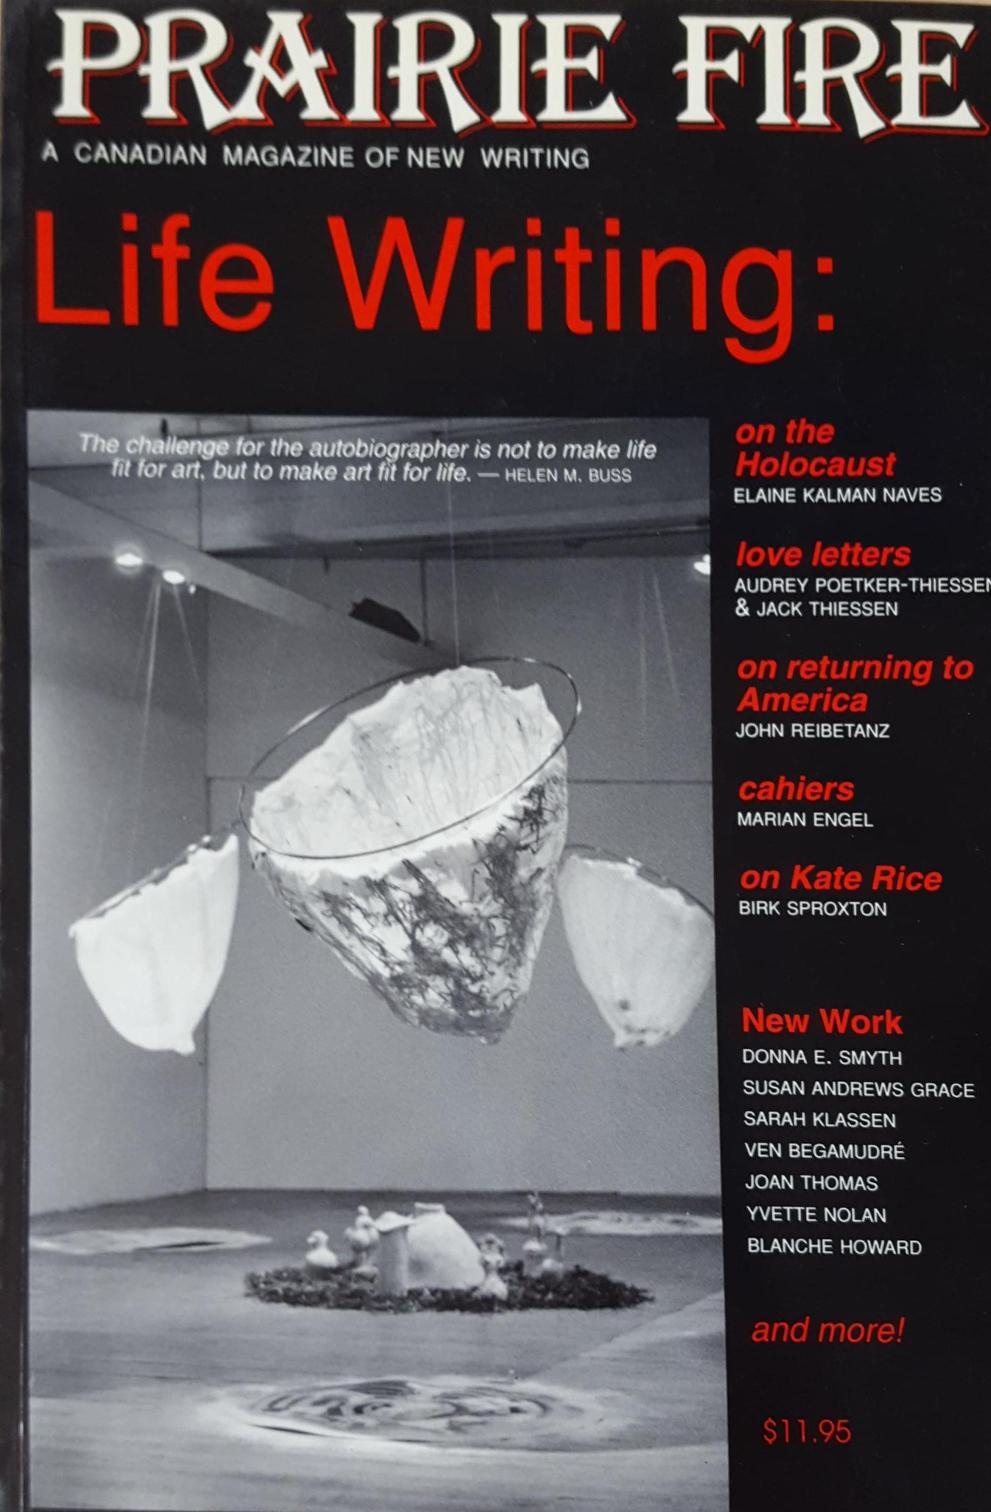 16.3 book cover